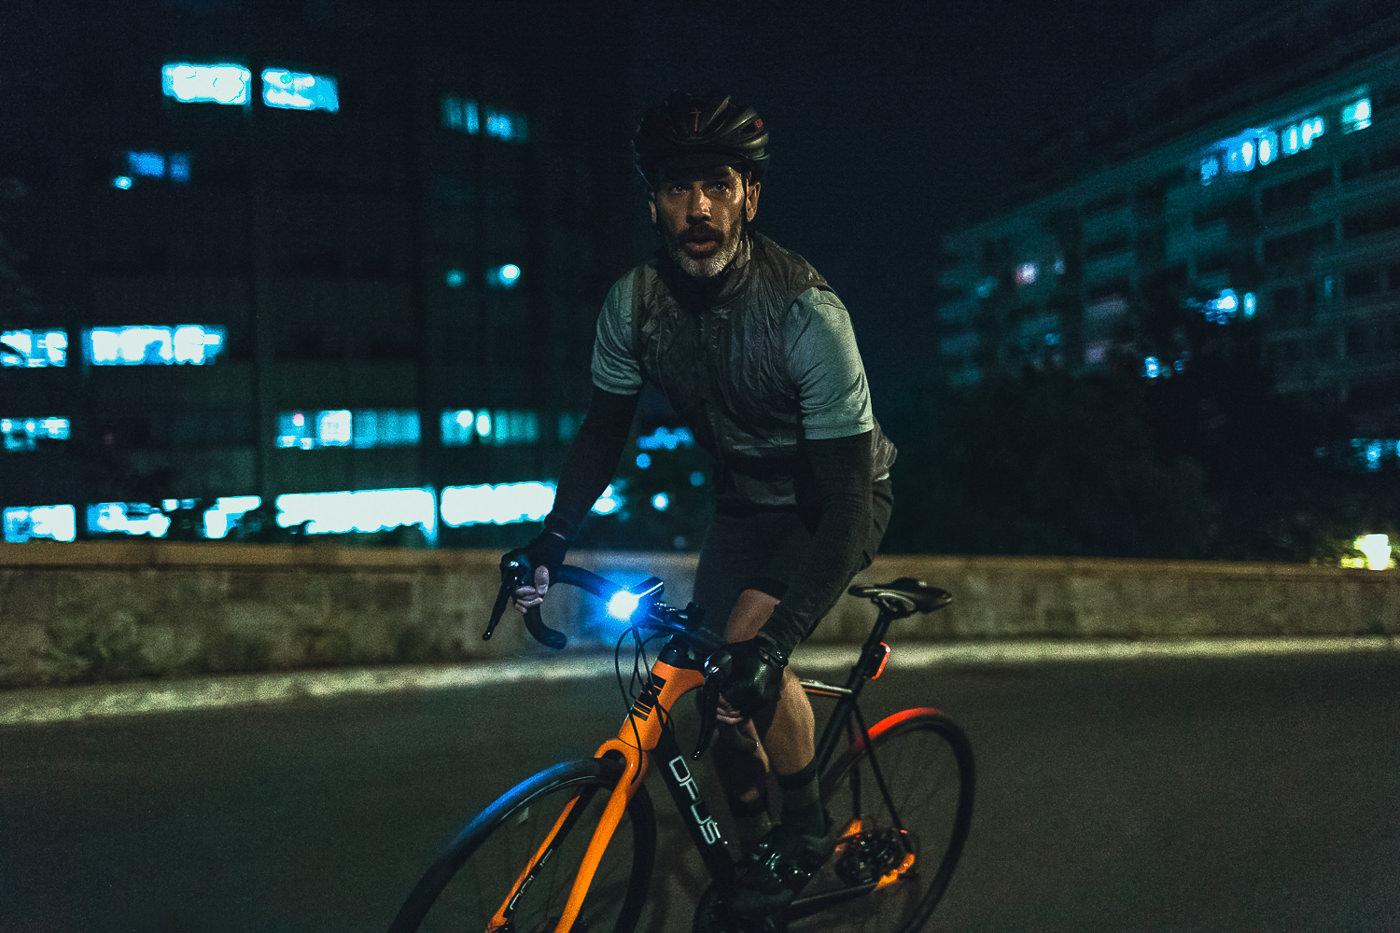 Cycliste sur un vélo de route Opus décor urbain